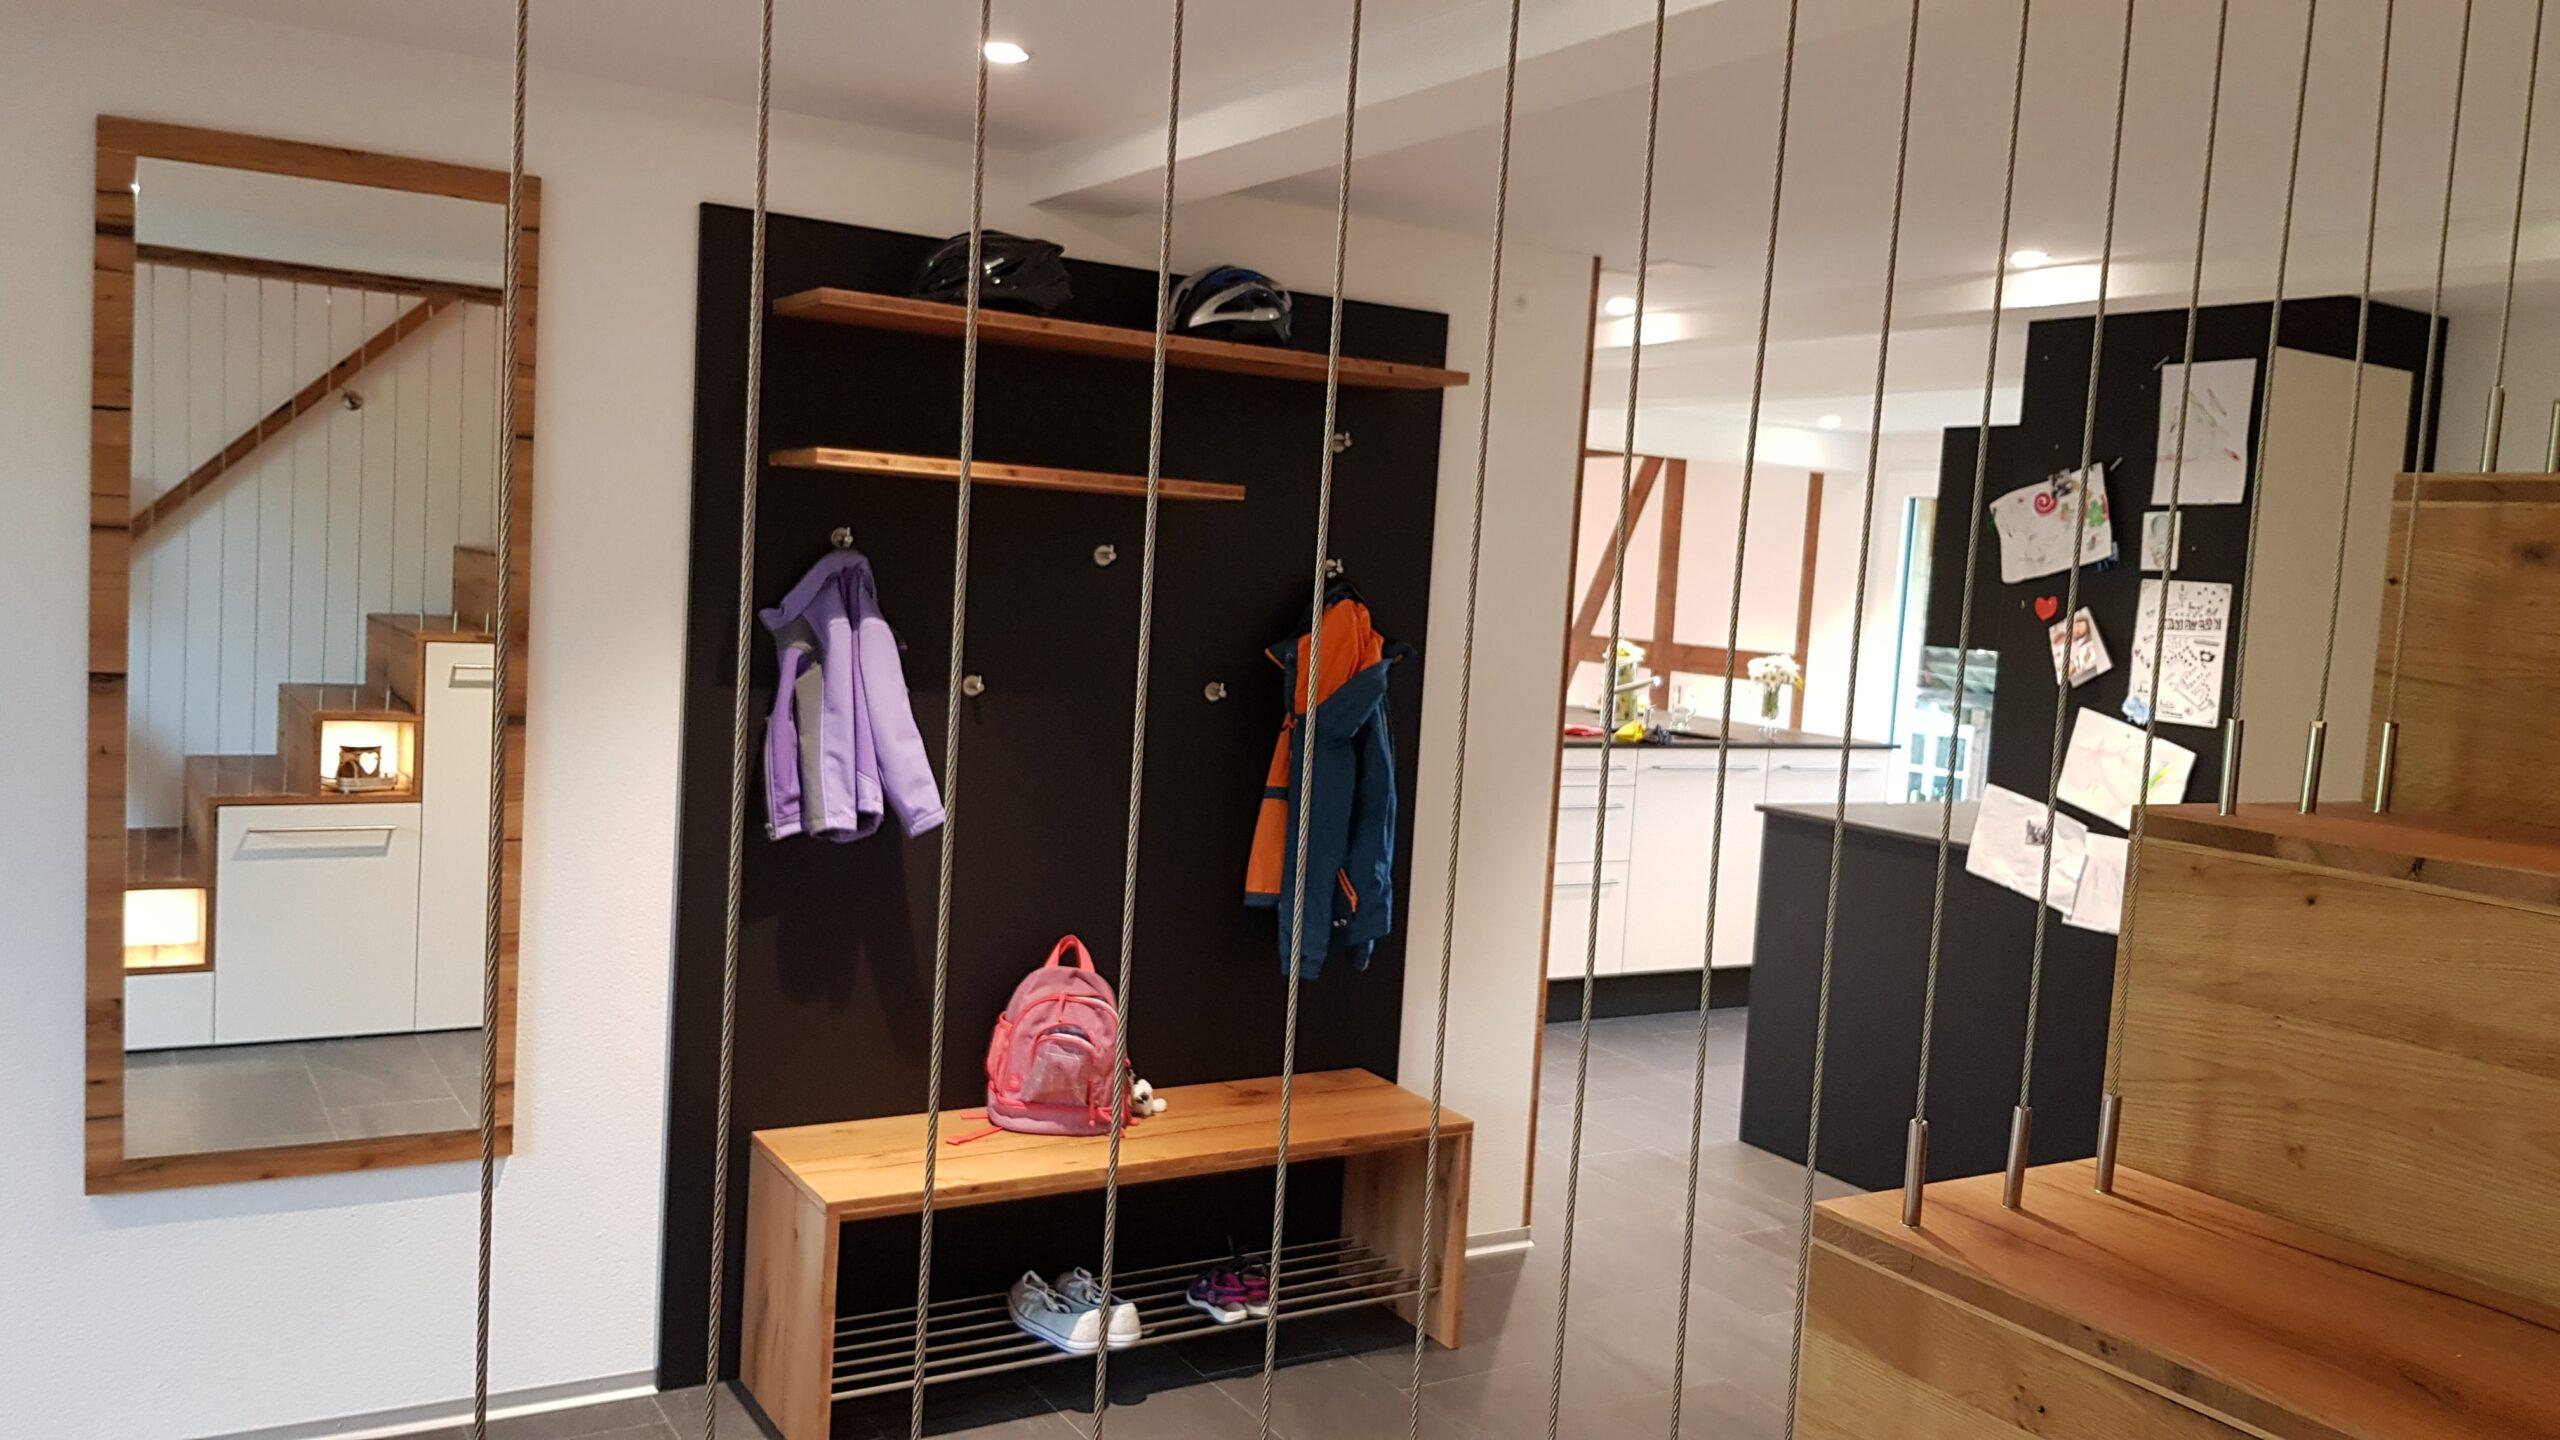 Wooddesign_Treppen_Teppengeländer_Holztreppen_Treppenverkleidung_Treppenmöbel (2)-min